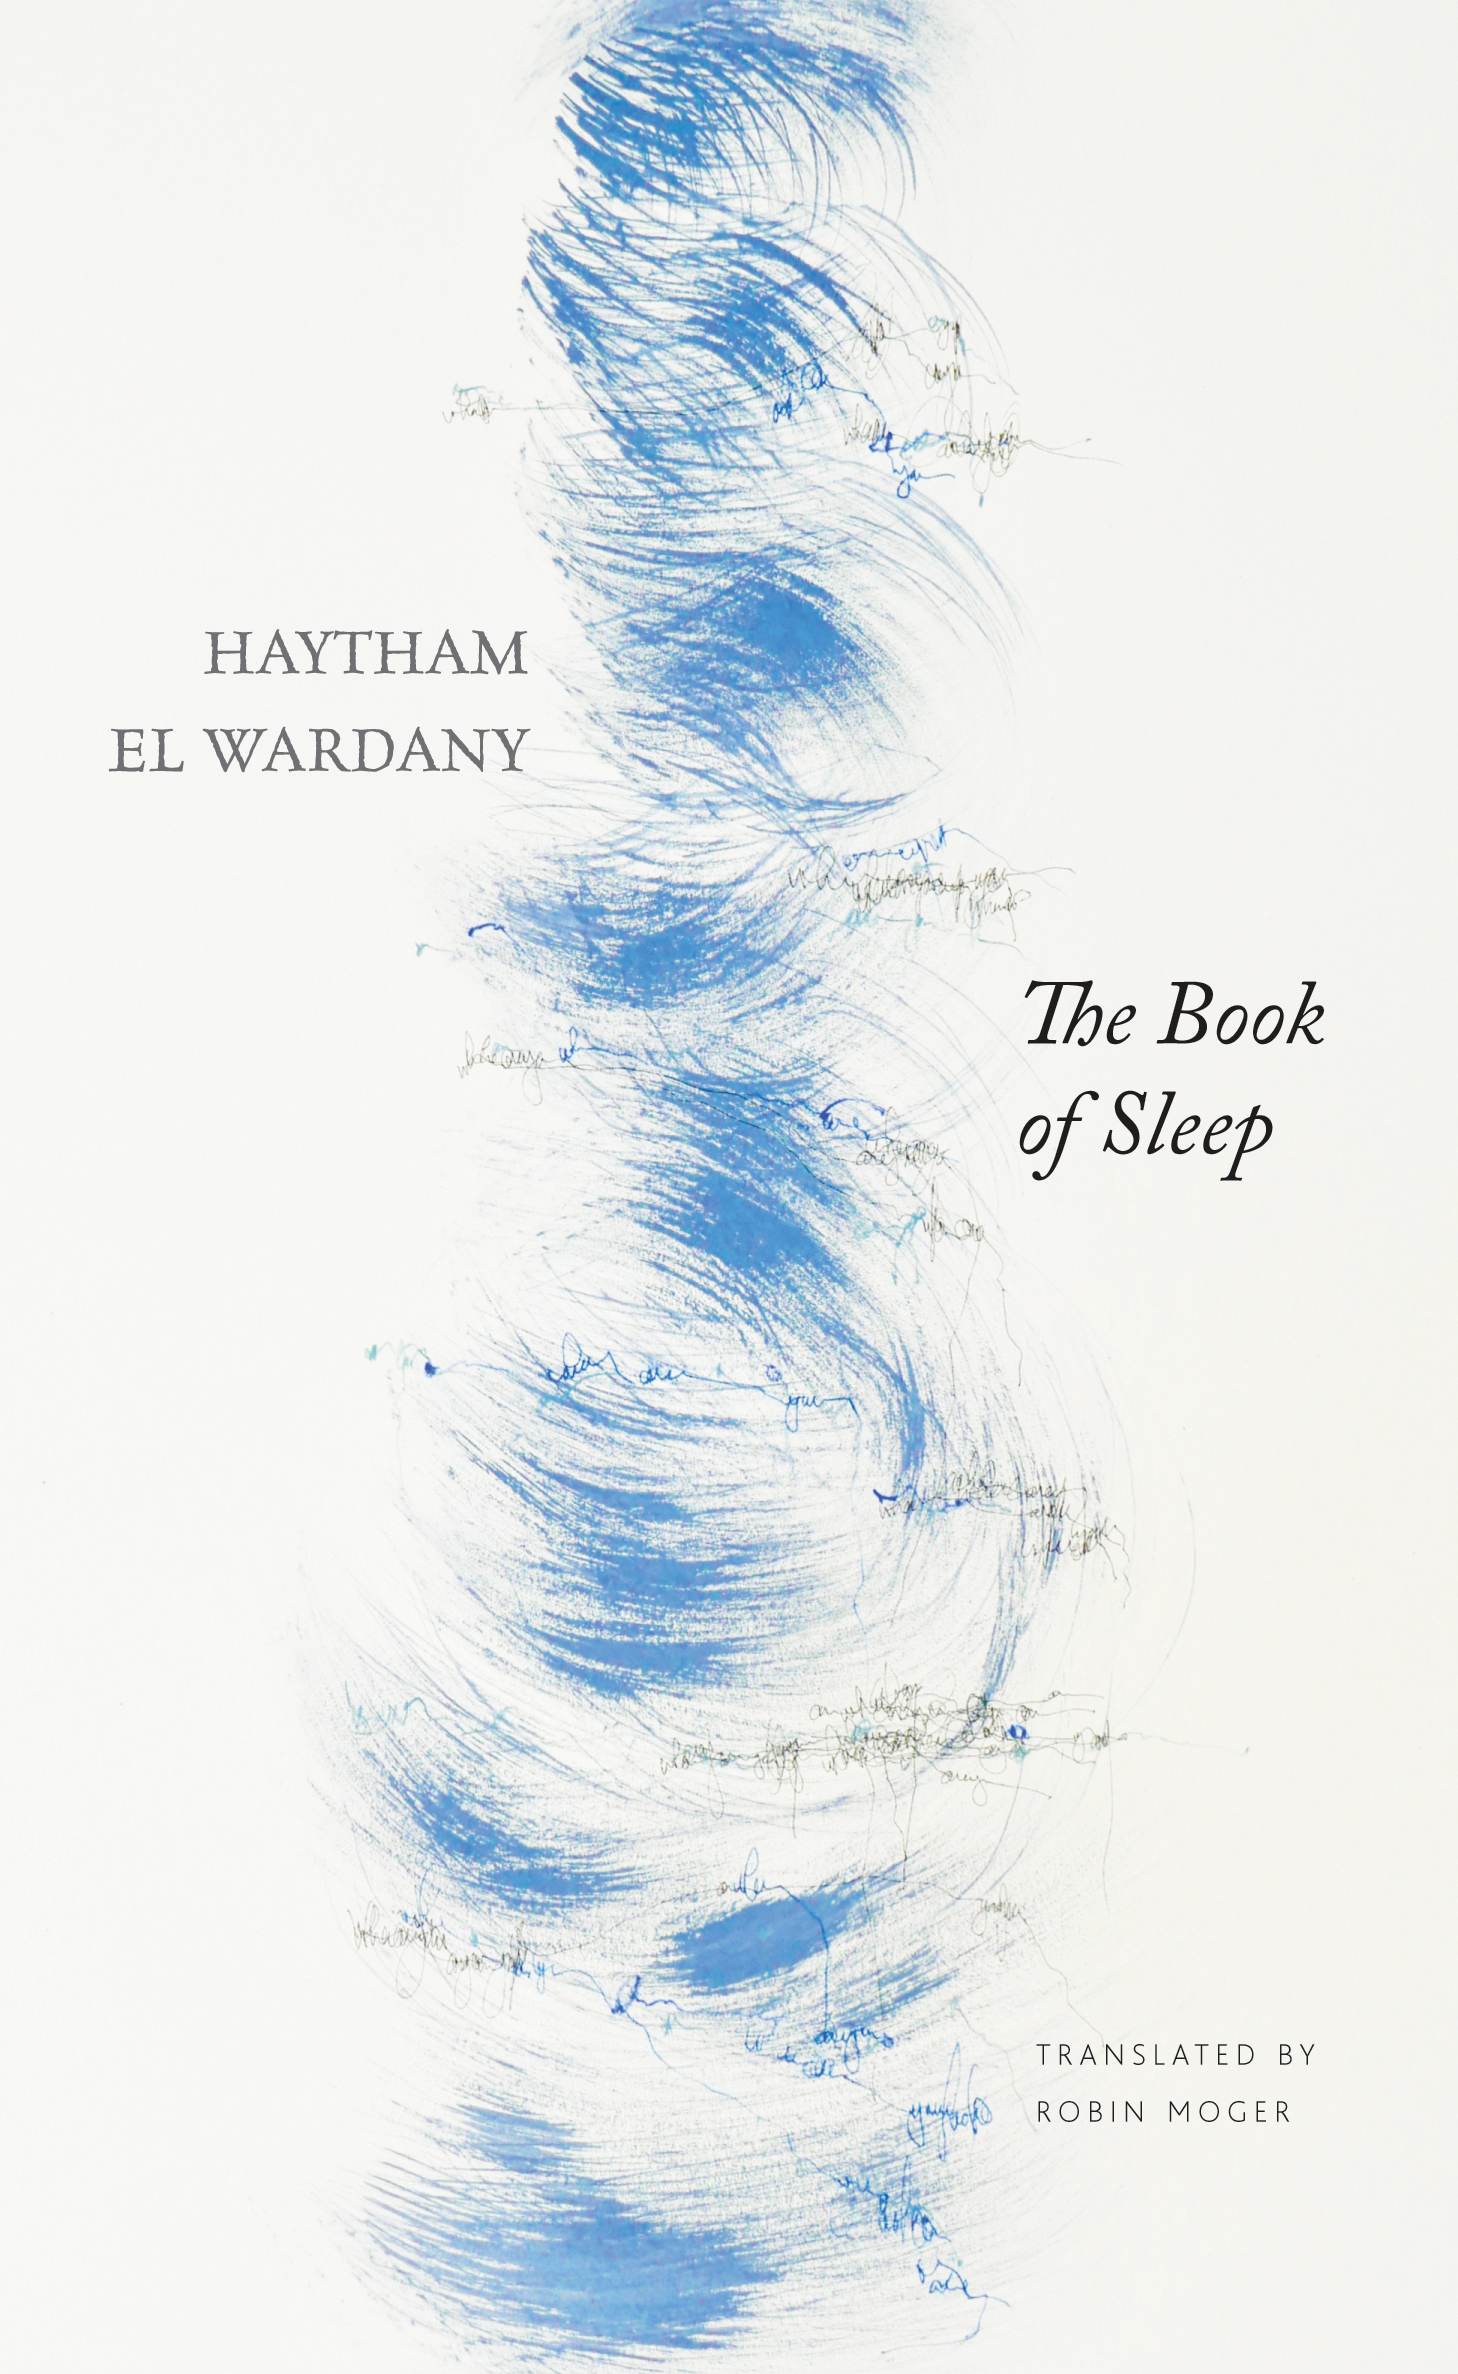 The Book of Sleep by Haytham El Wardany | Seagull Books